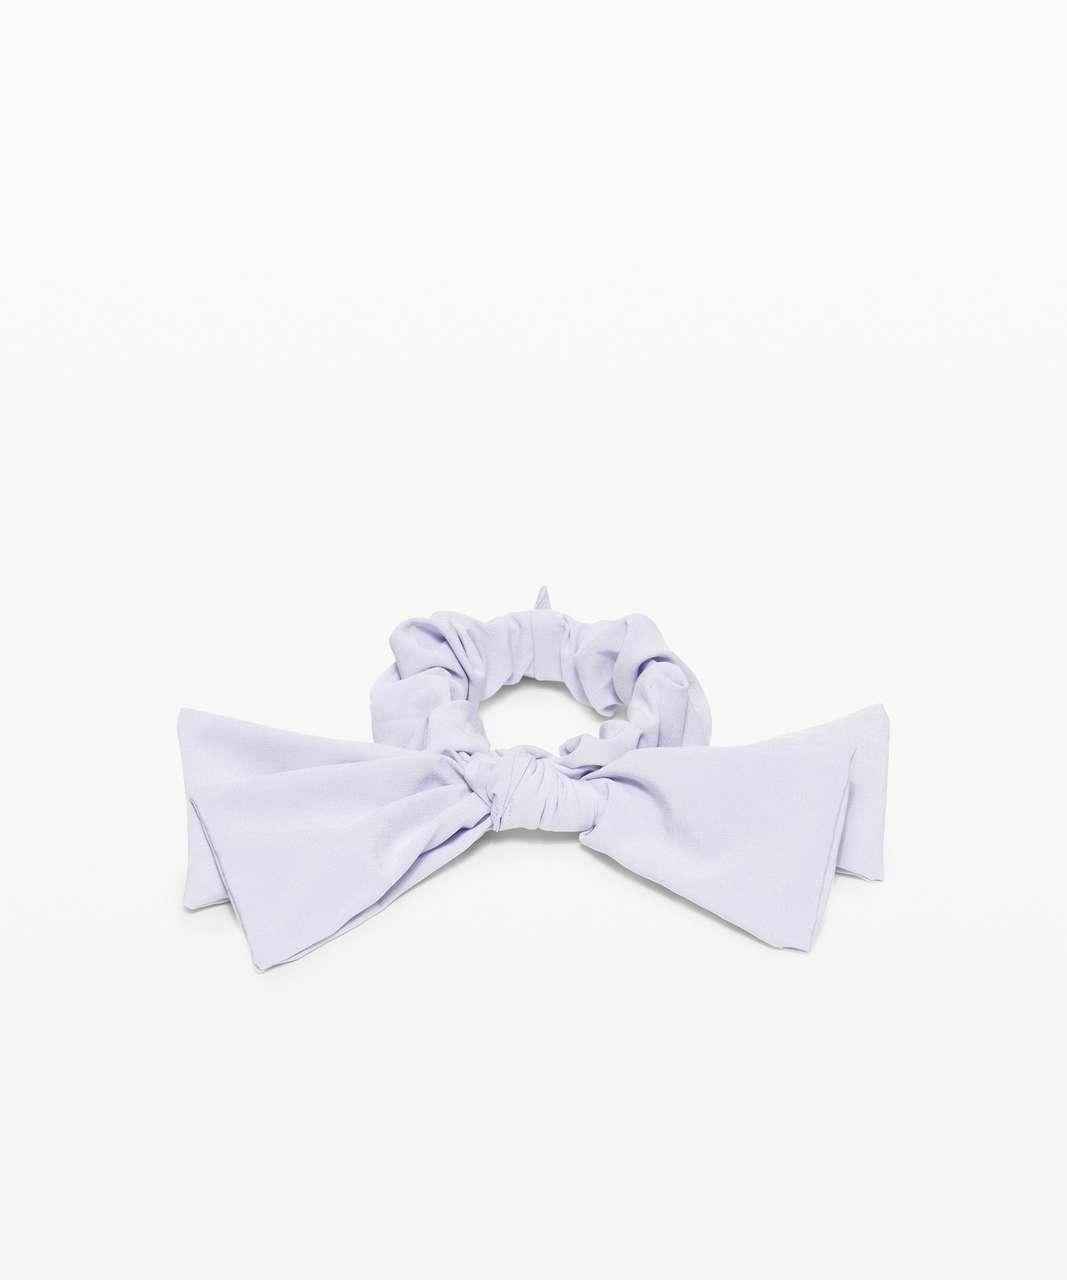 Lululemon Uplifting Scrunchie *Ribbon - Serene Blue